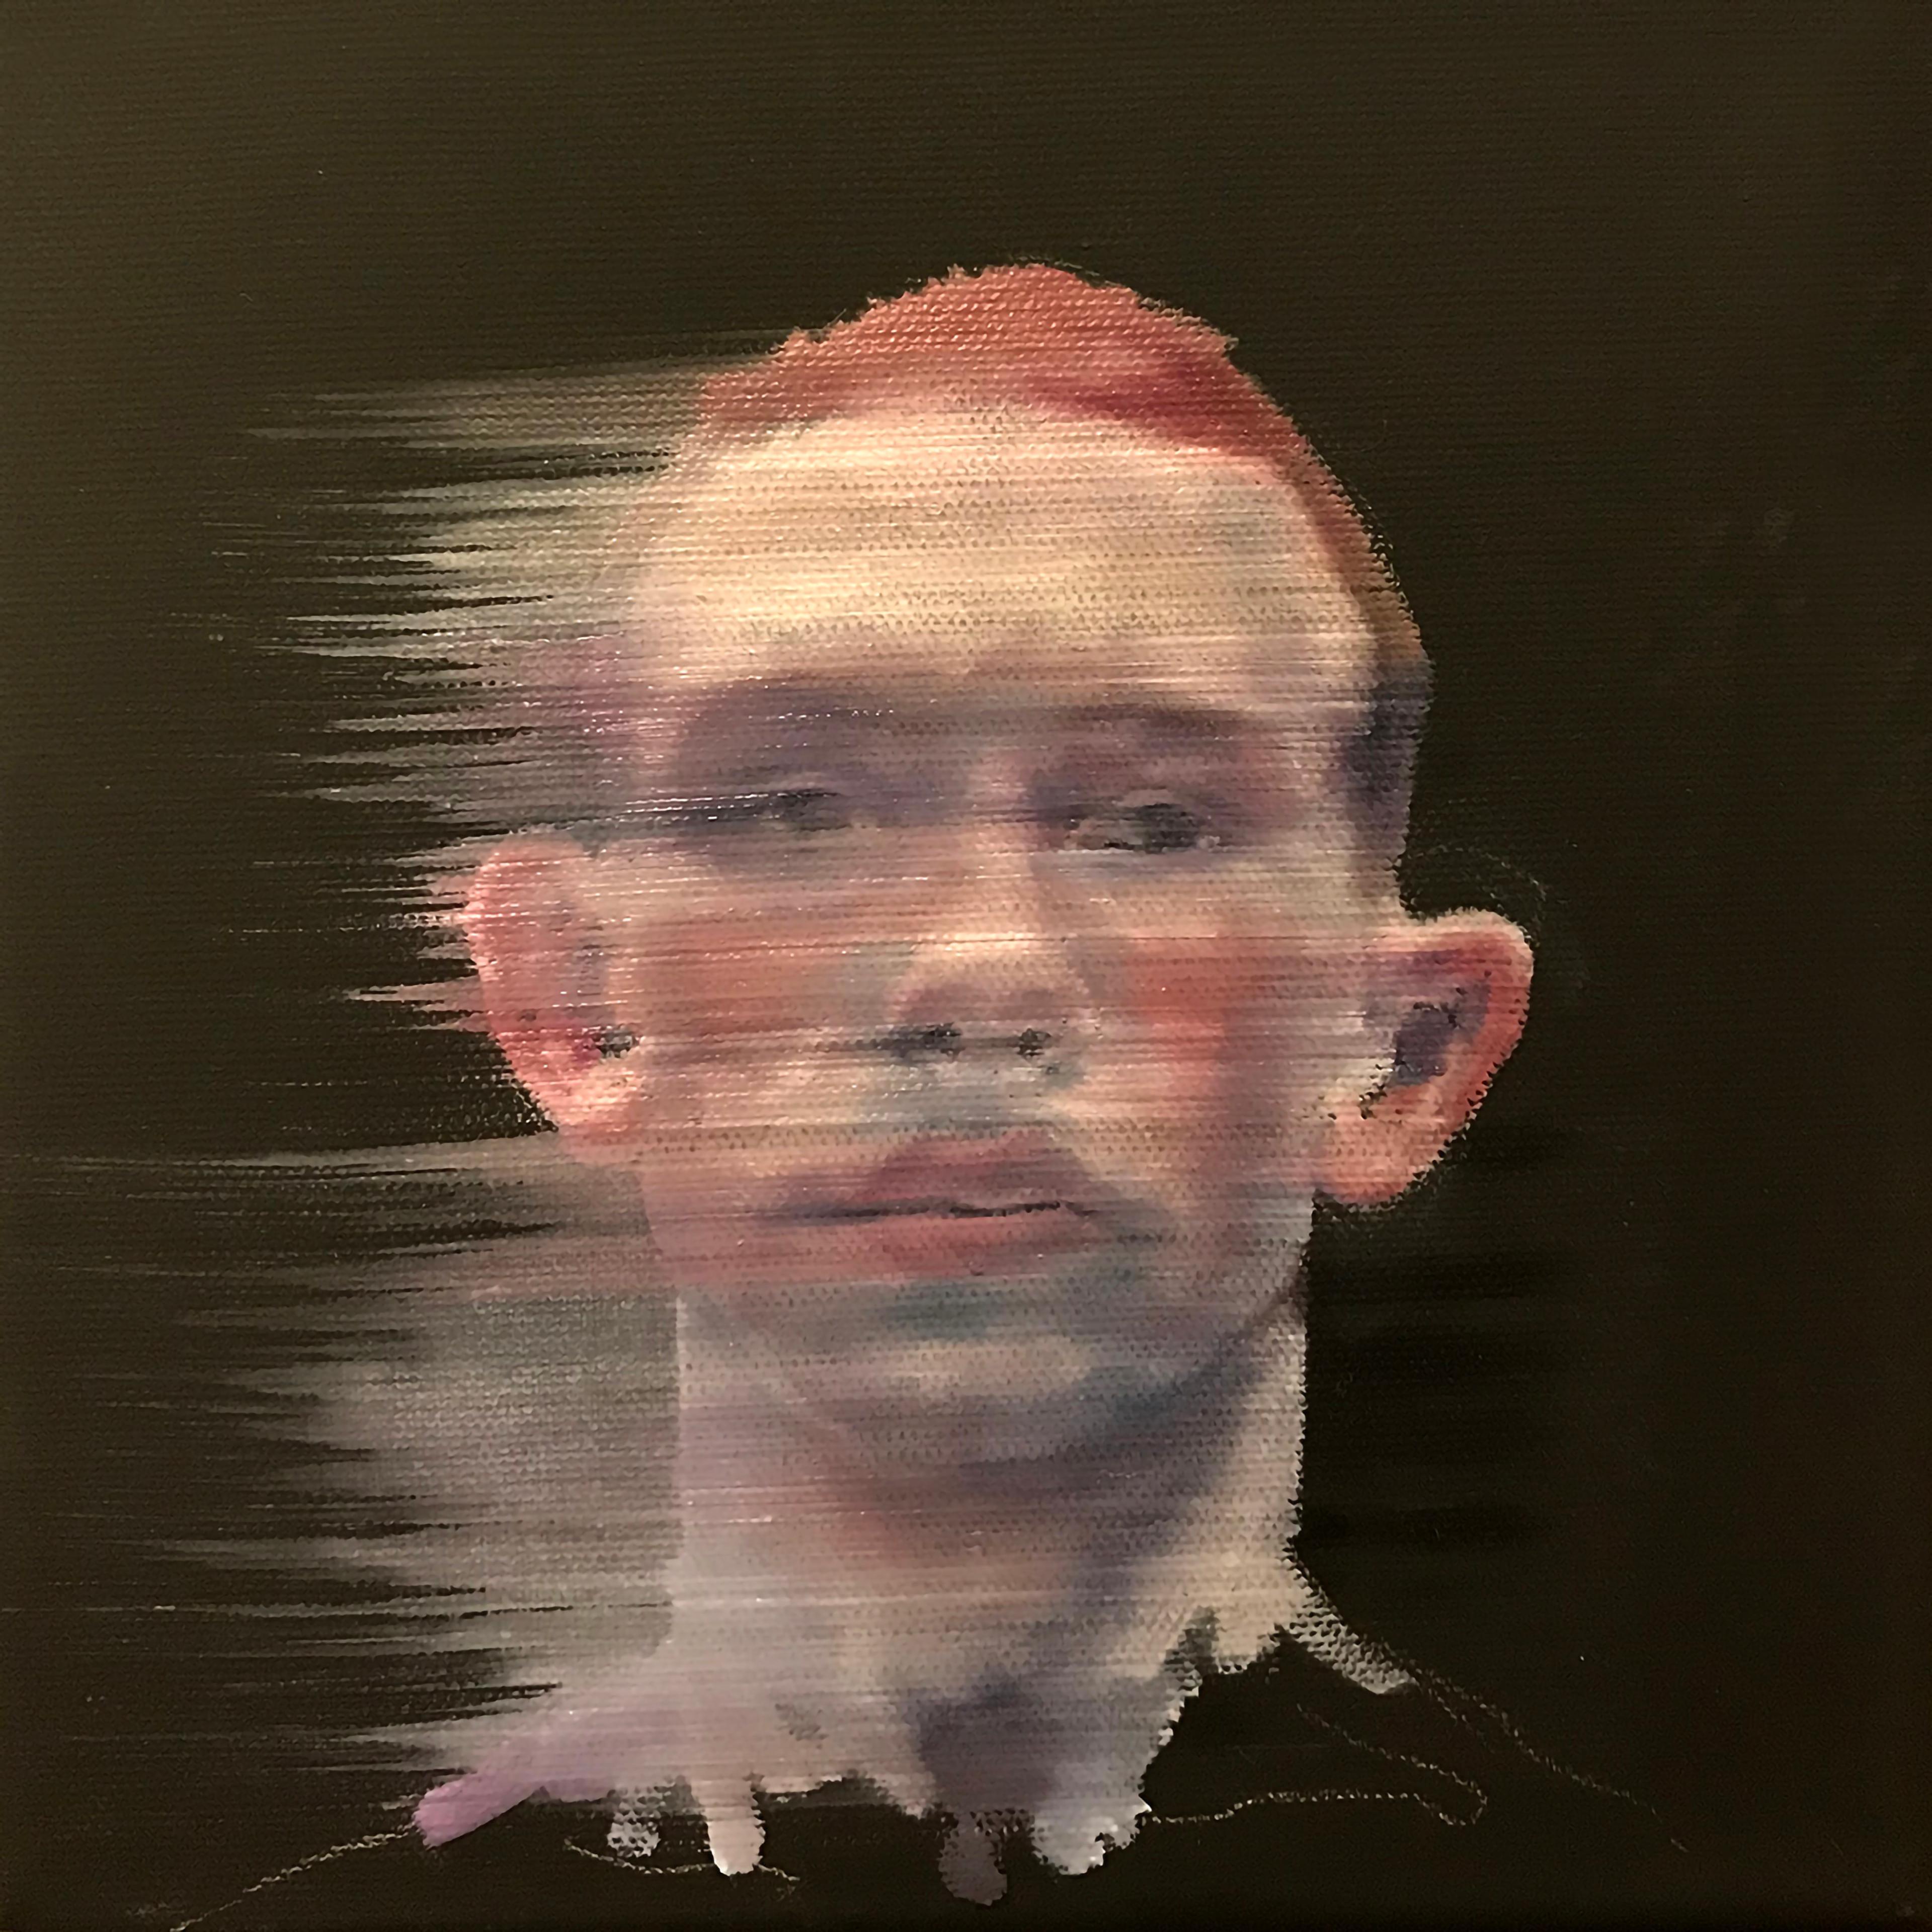 artwork Samuel by Claudia Mächler